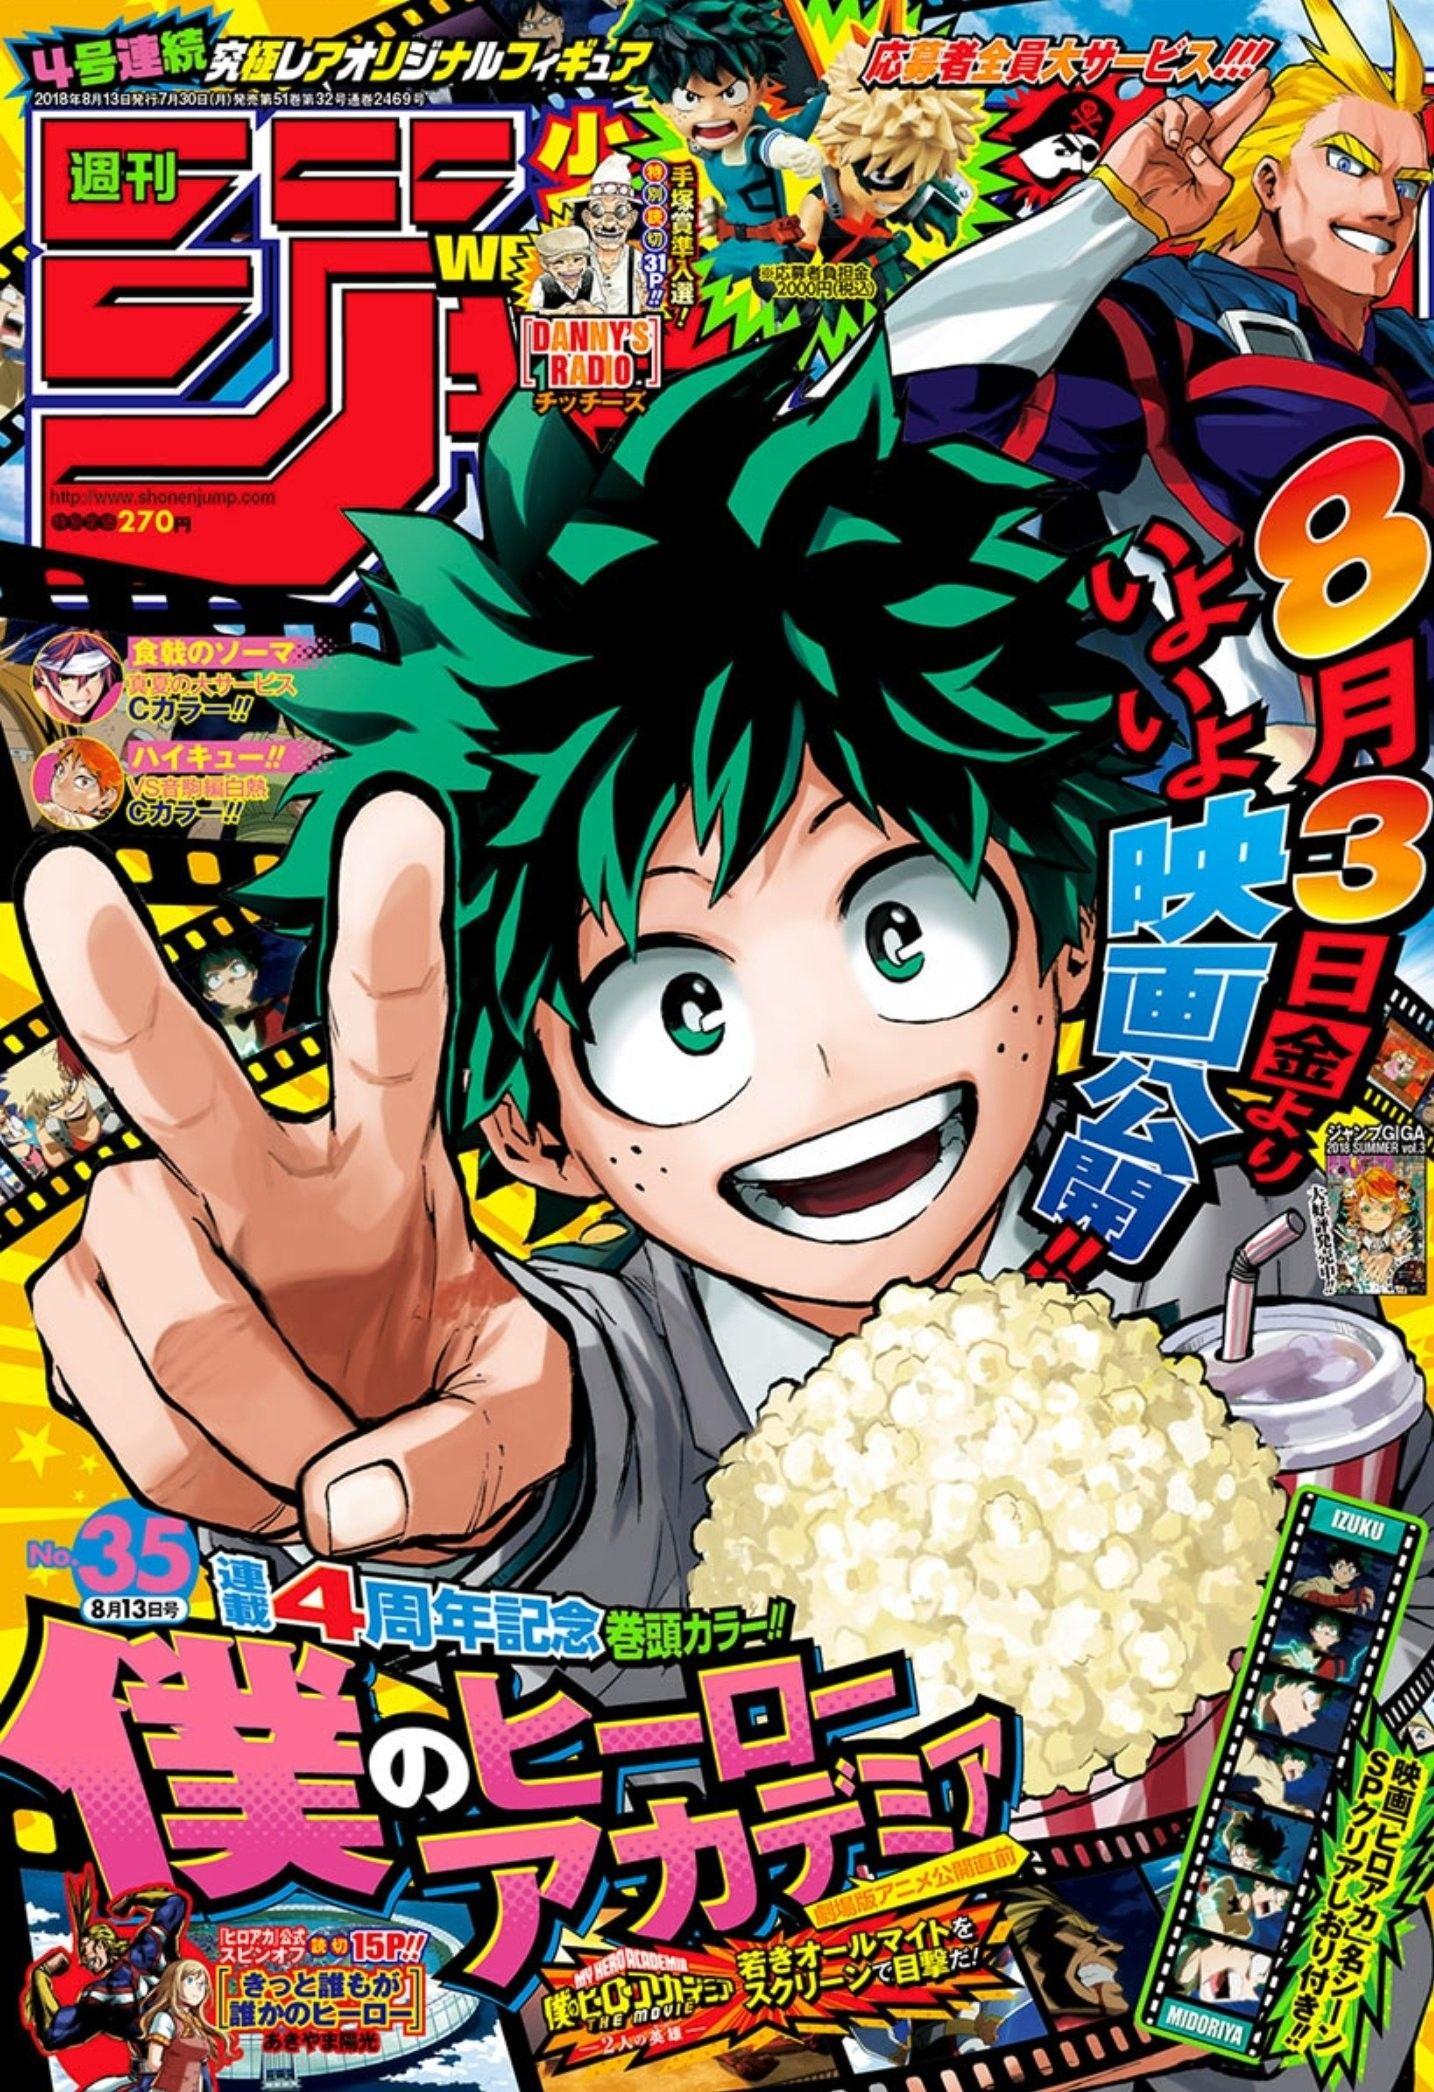 Shonen Jump Issue 35 Cover My Hero Academia My Hero Academia